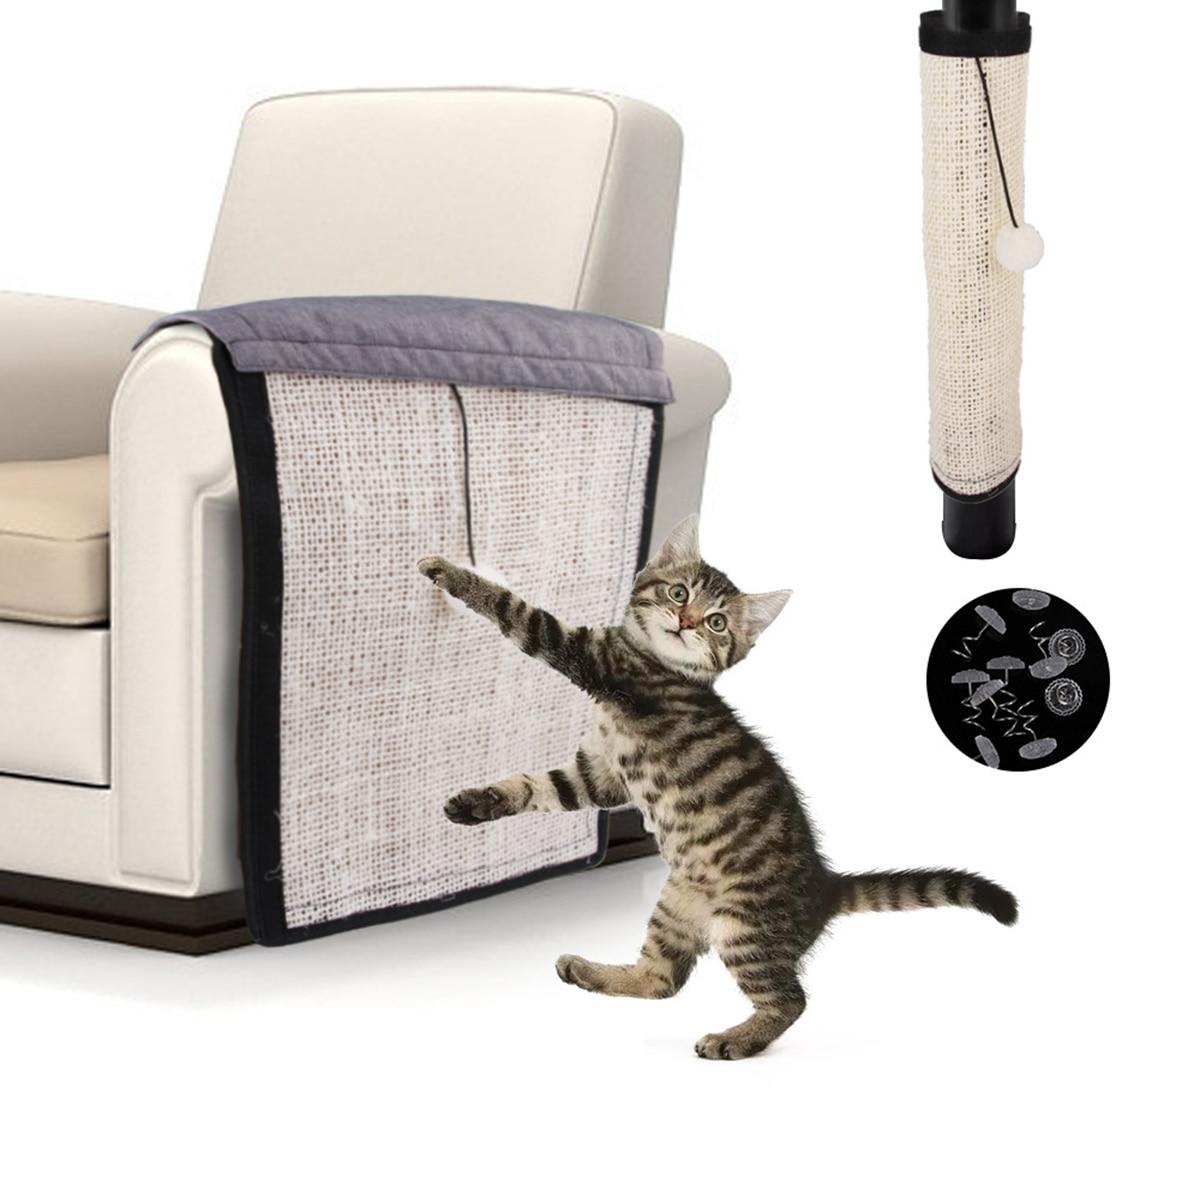 Protector de muebles para gatos y gatitos, alfombrilla para rascar Sisal, rascador, garras cuidado de gatos, juguete para sofá, poste para rascar, producto para mascotas protector